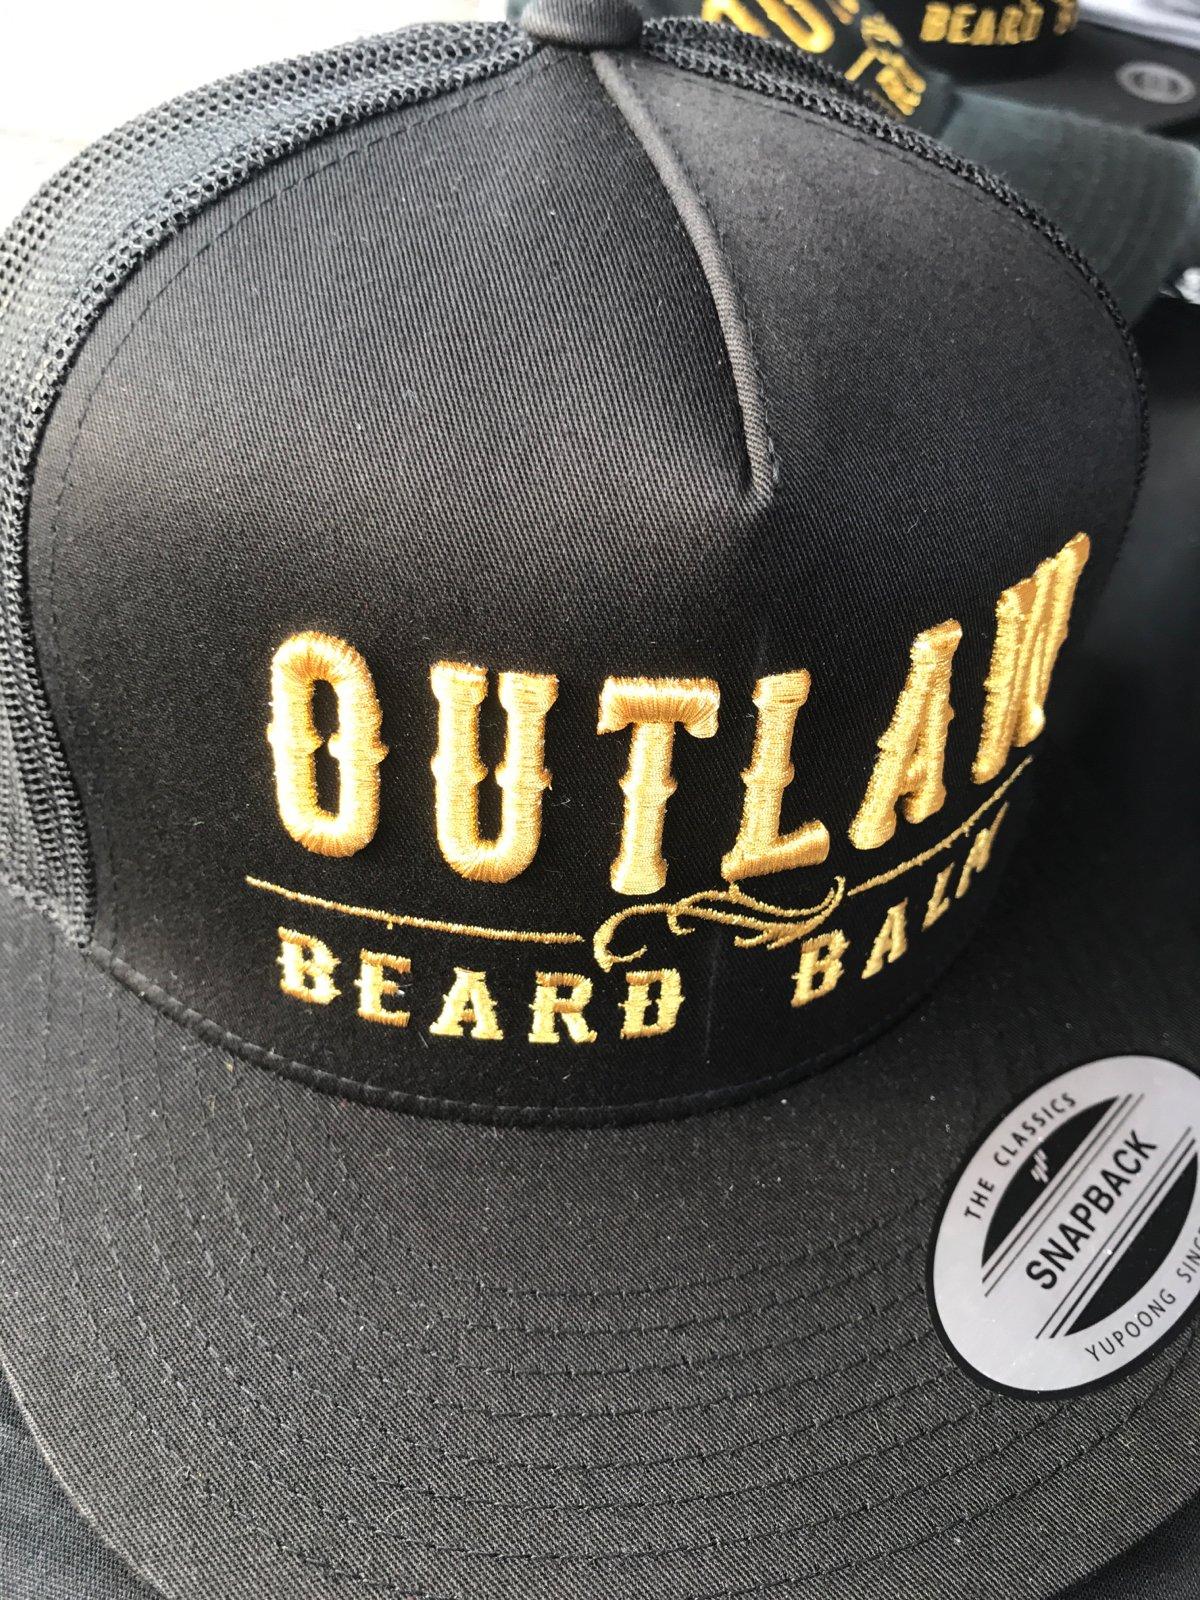 Image of OUTLAW BEARD BALM BLK MESH SNAPBACK